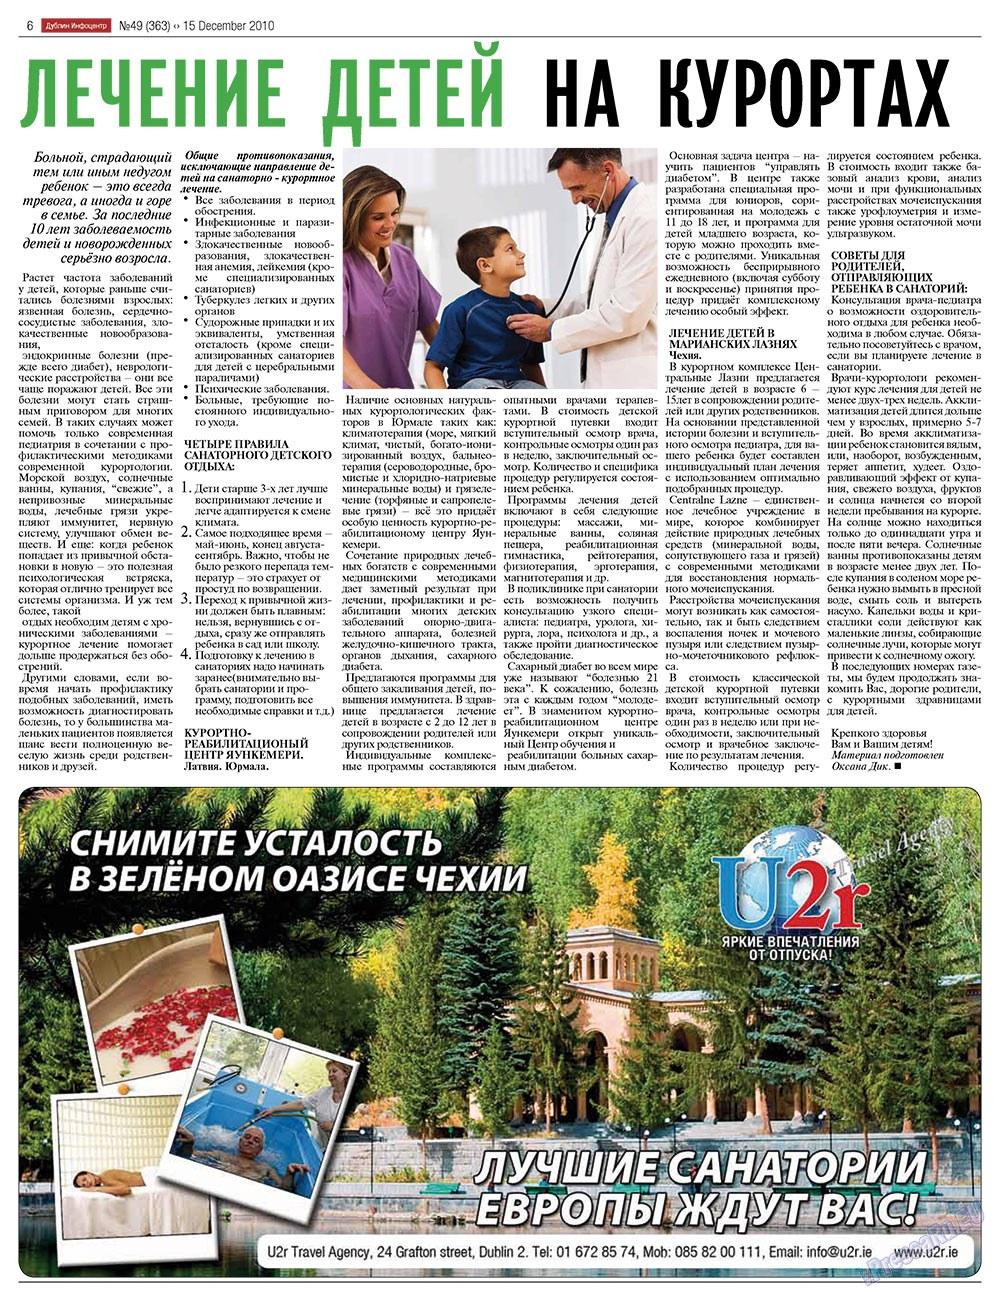 Дублин инфоцентр (газета). 2010 год, номер 49, стр. 6